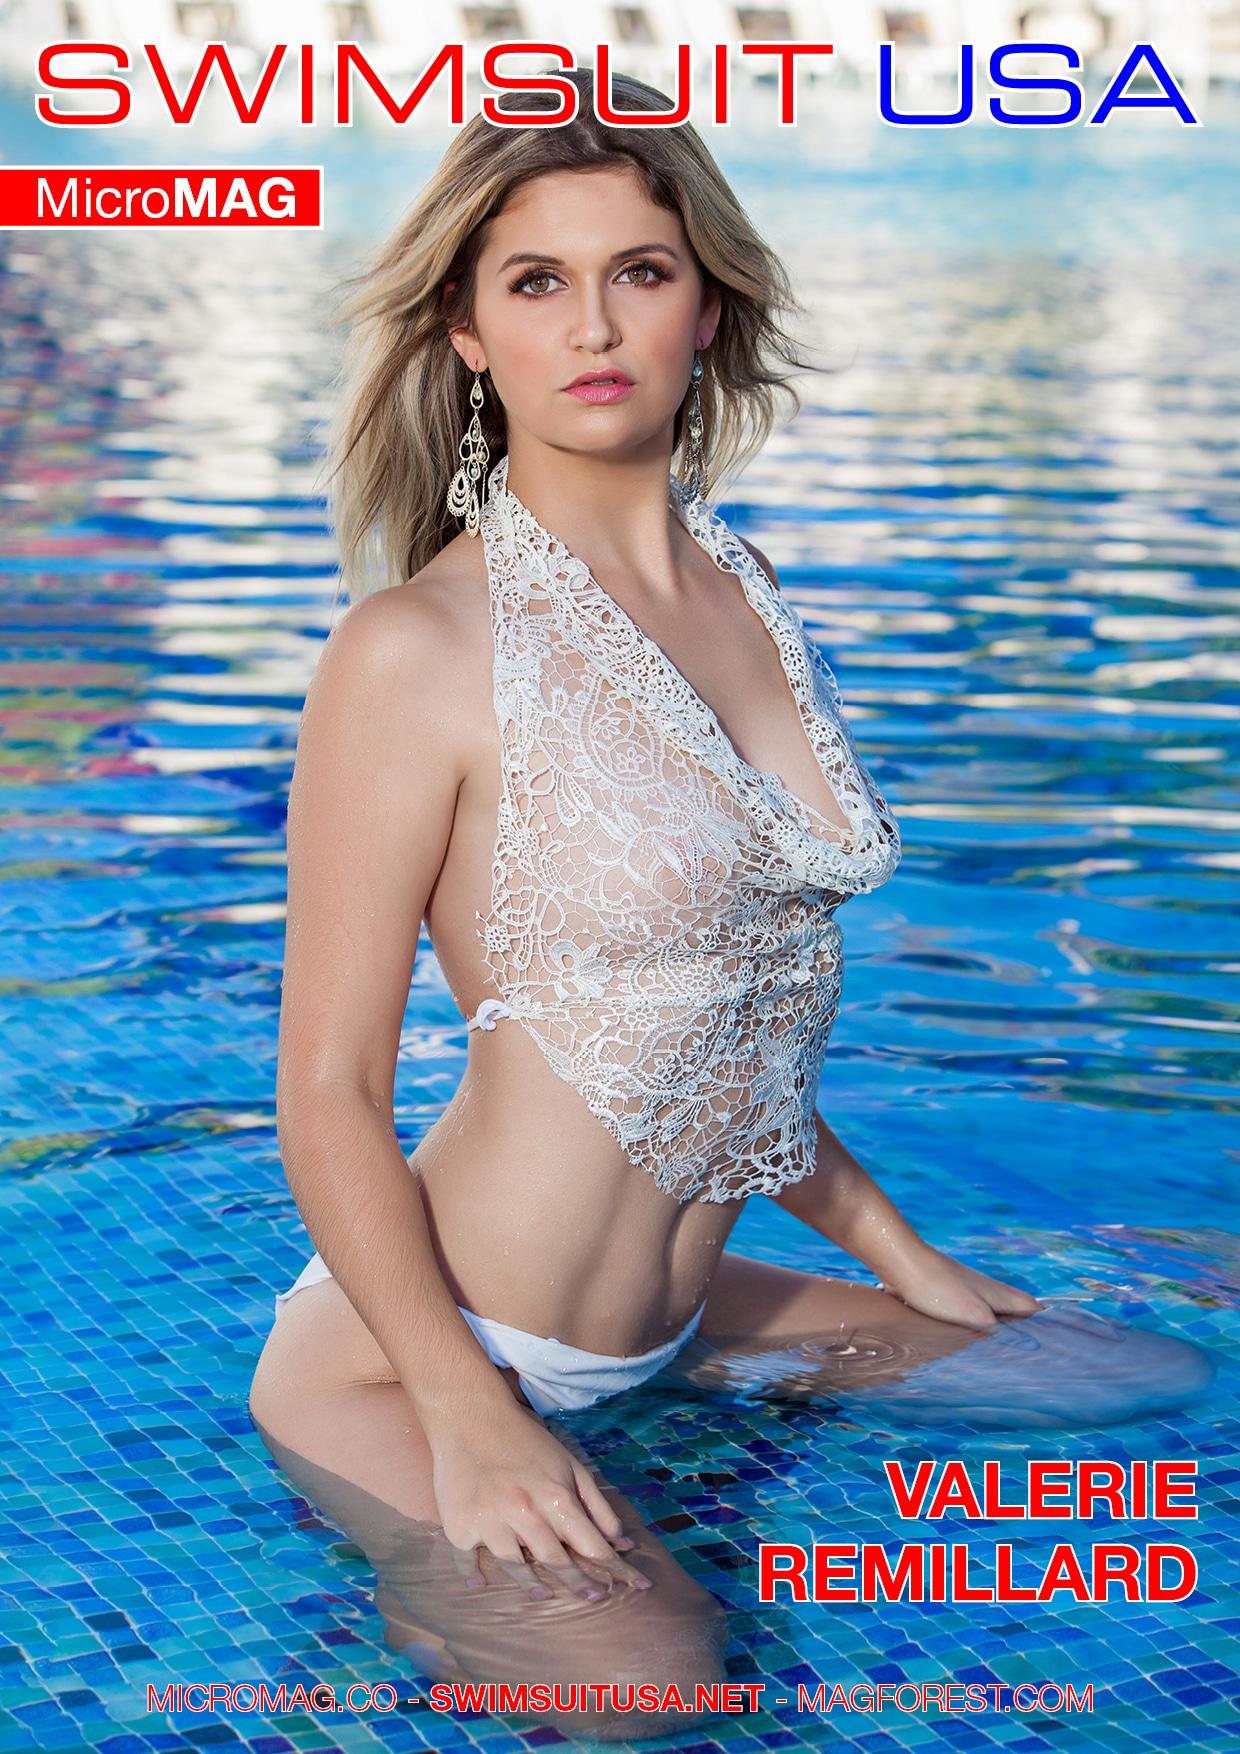 Swimsuit Usa Micromag – Valerie Remillard